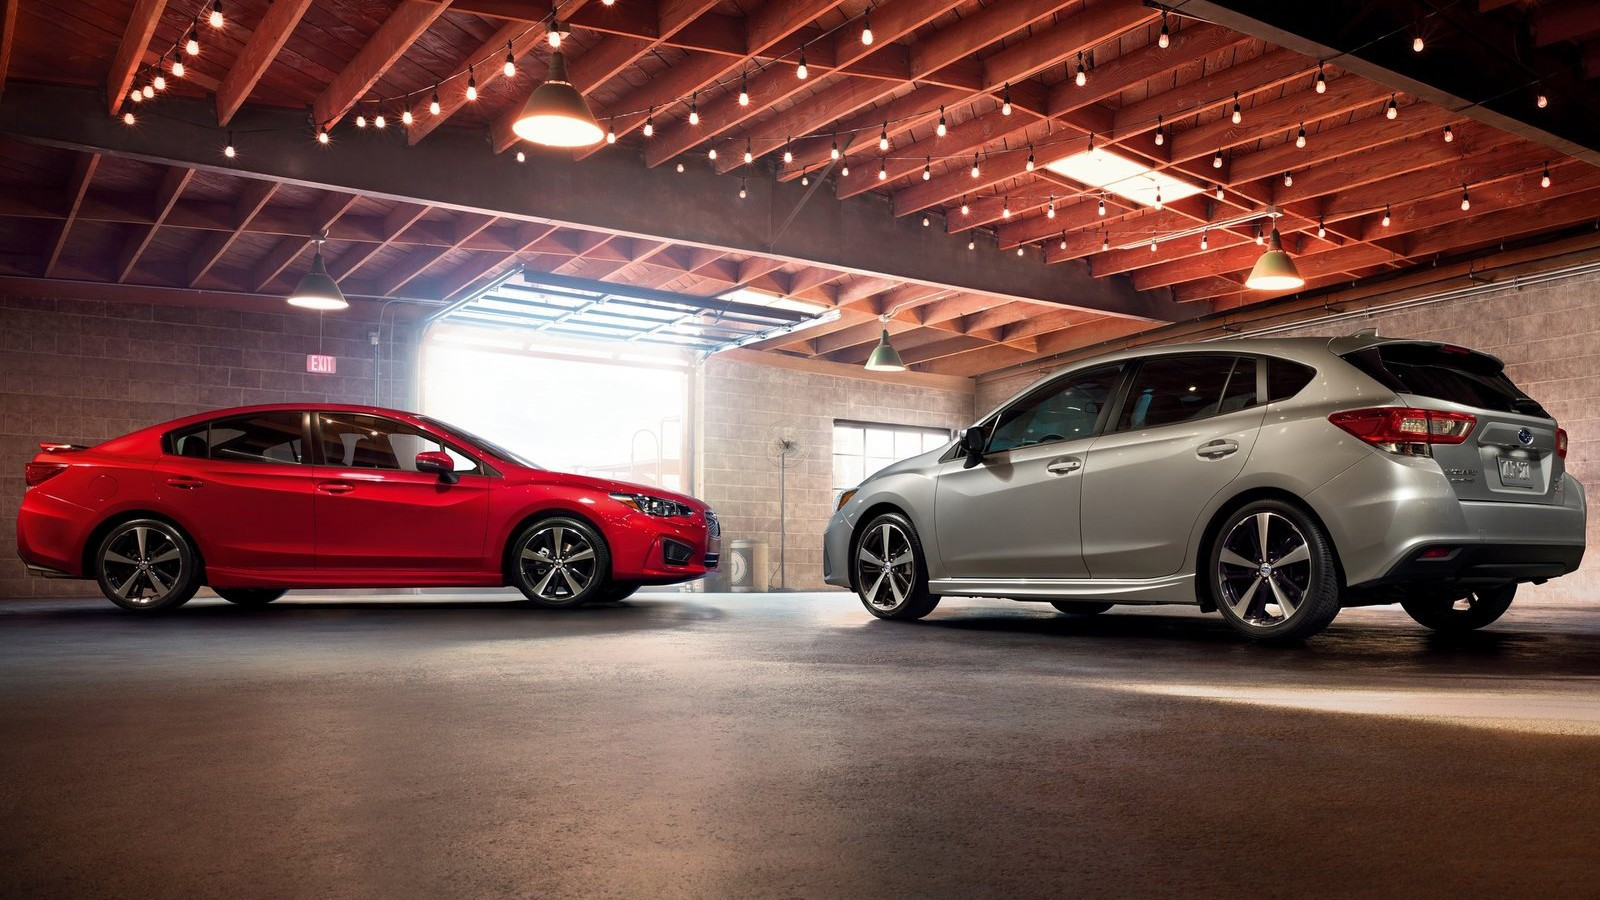 Subaru-Impreza-2017-1600-12-1600x0-c-default